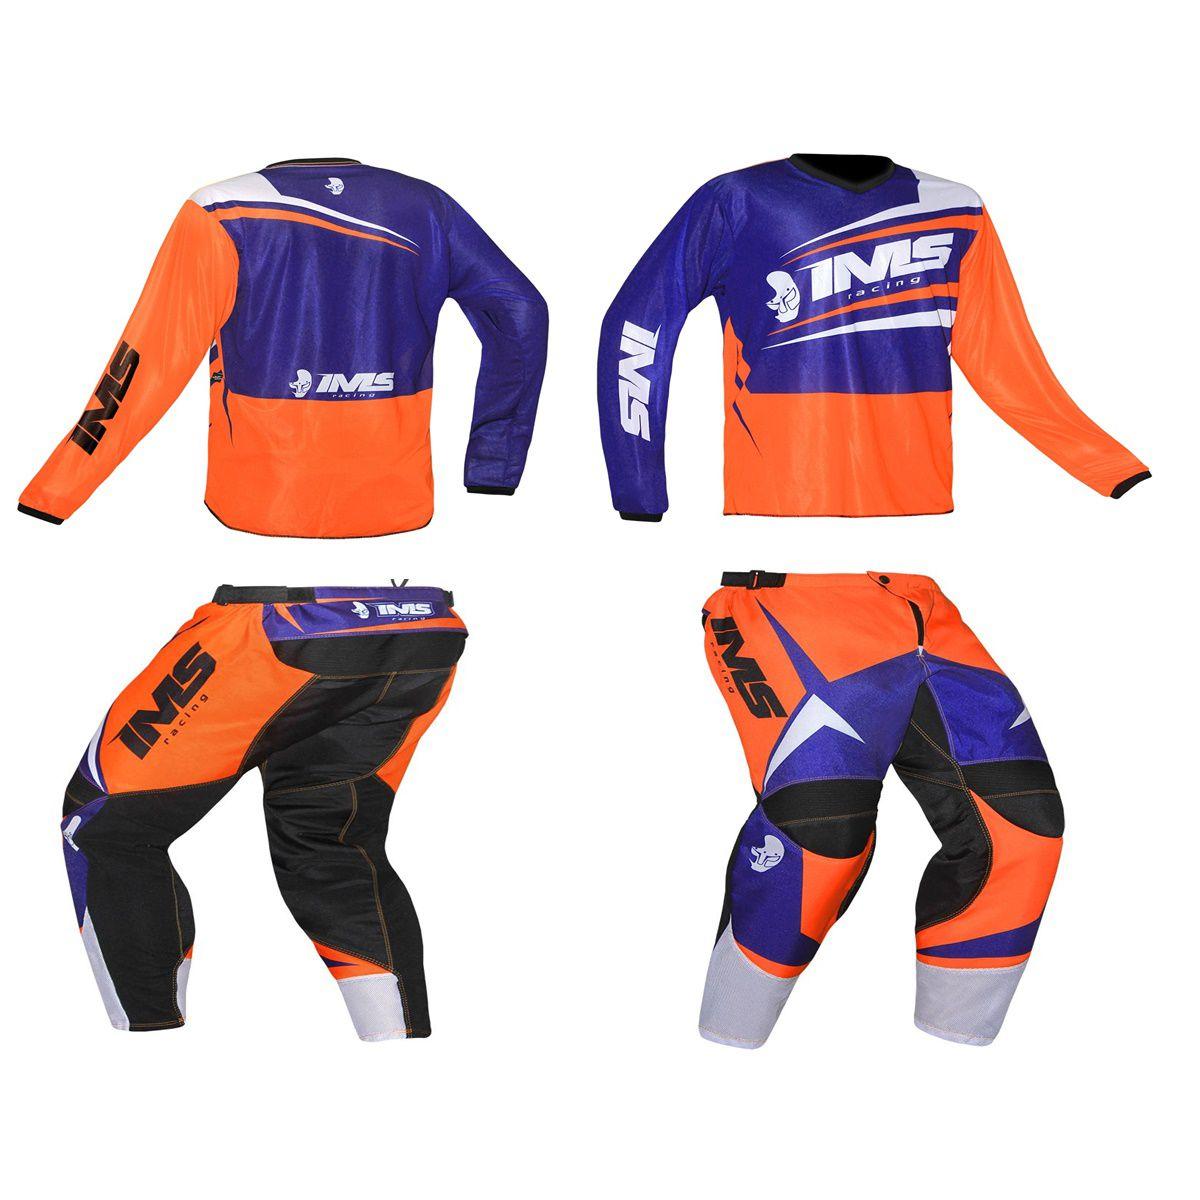 Kit Roupa Ims Infantil Flex Calça e Camisa Motocross Trilha